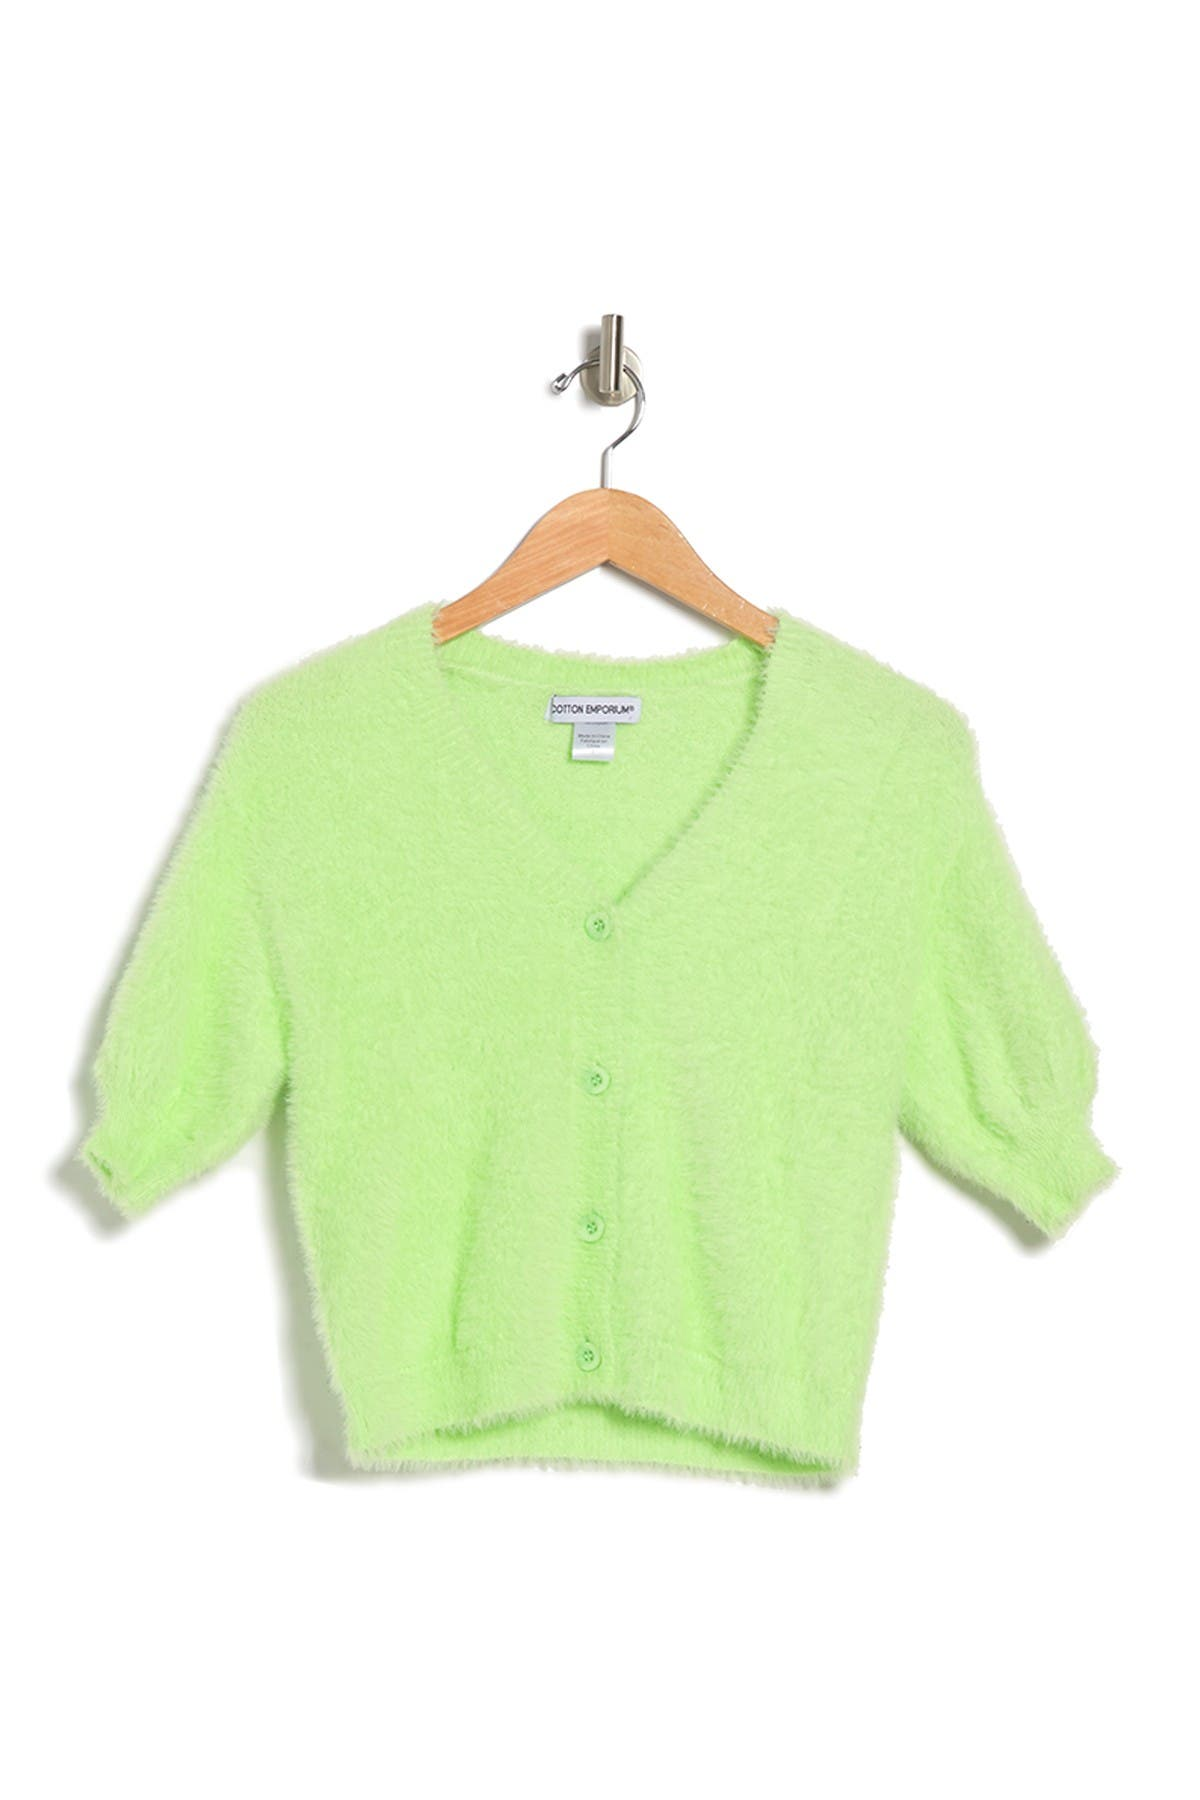 Image of Cotton Emporium Eyelash Button Front Cardigan